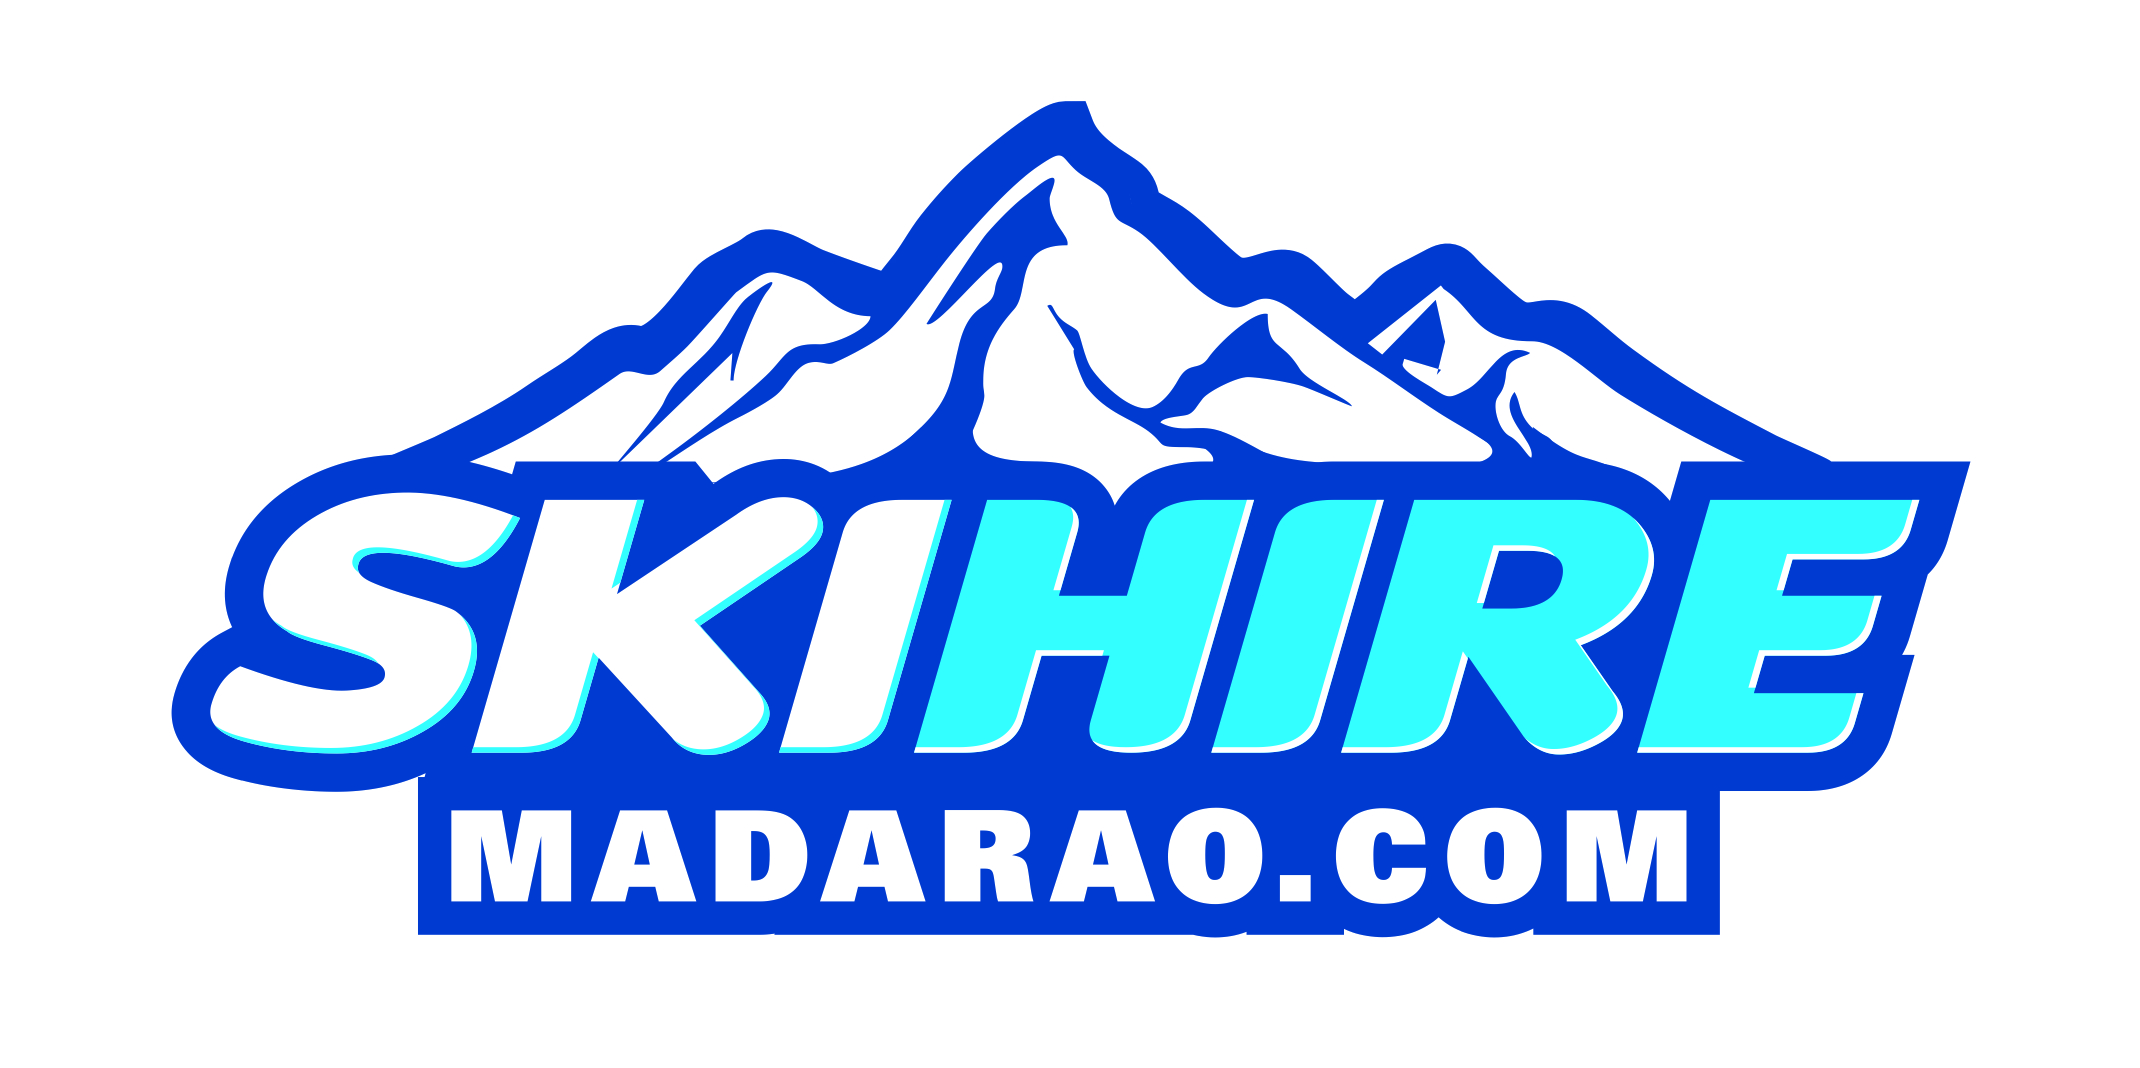 Ski Hire Madarao